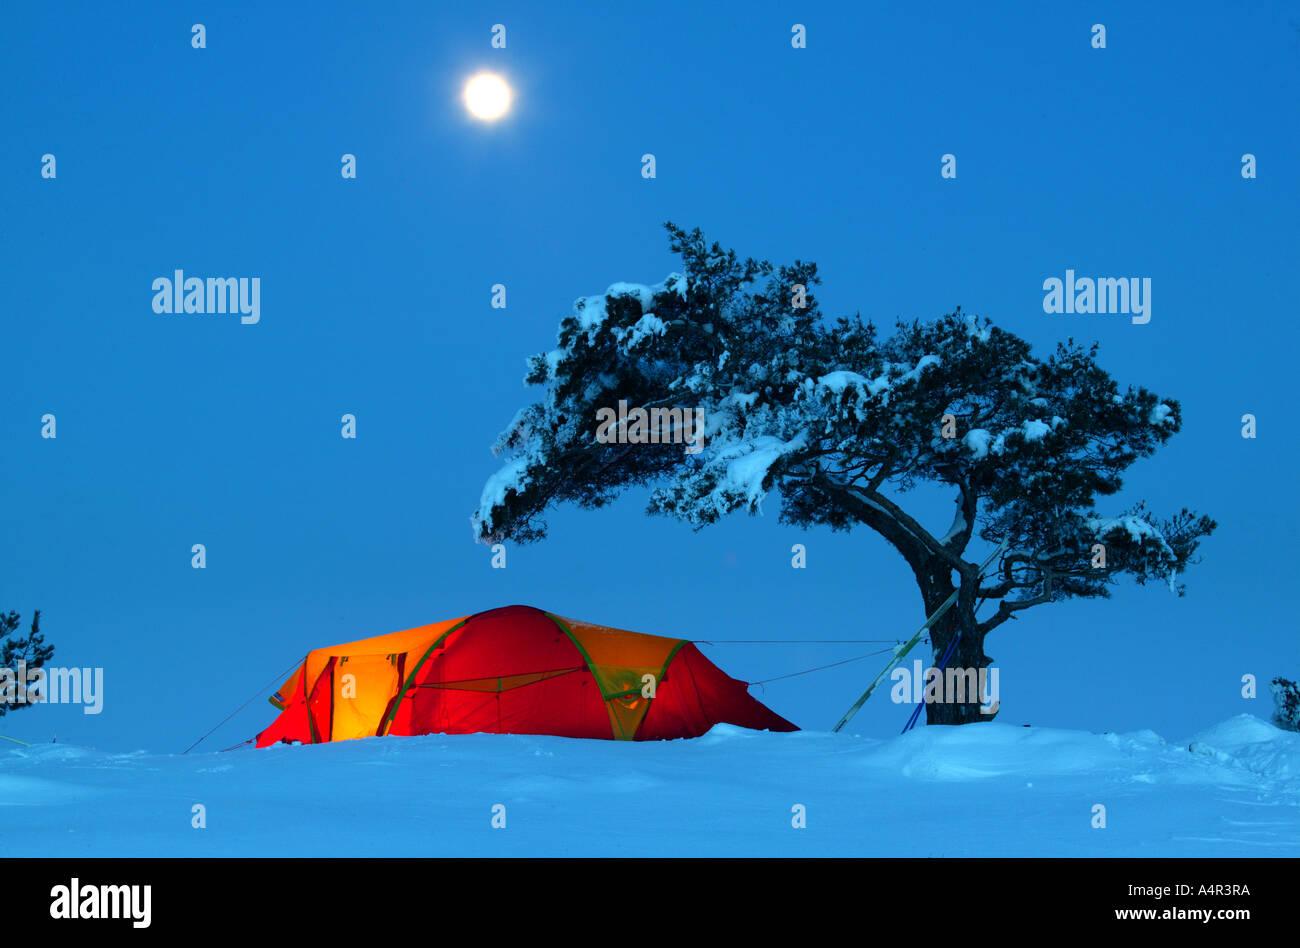 Winter Camp bei Moskjaera im See Vansjø, råde Kommune, Østfold fylke, Norwegen. Stockbild